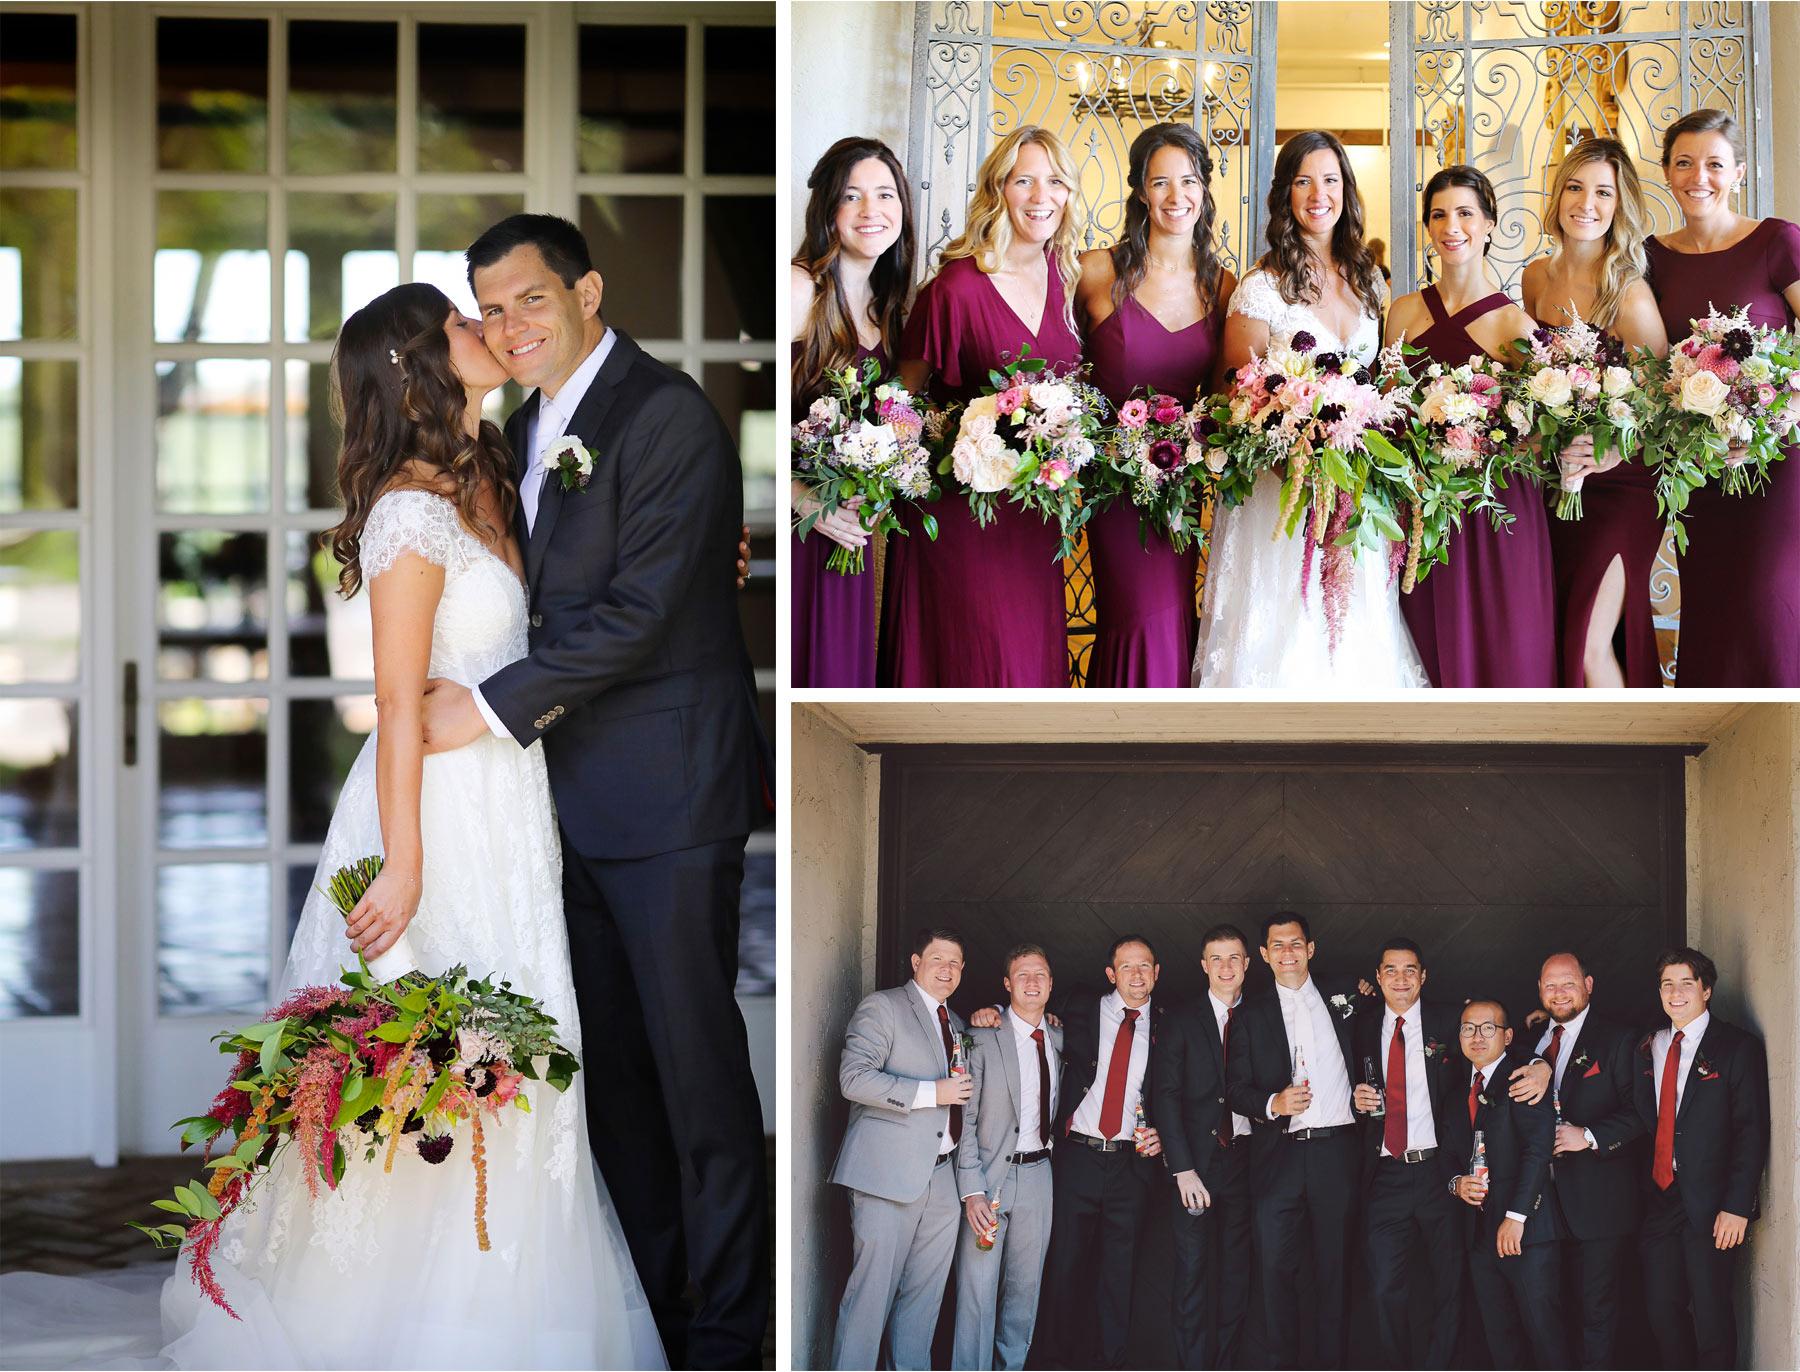 09-Weding-by-Vick-Photography-Minneapolis-Minnesota-Bavaria-Downs-Bride-Groom-Kiss-Bridesmaids-Groomsmen-Rebecca-and-Mark.jpg